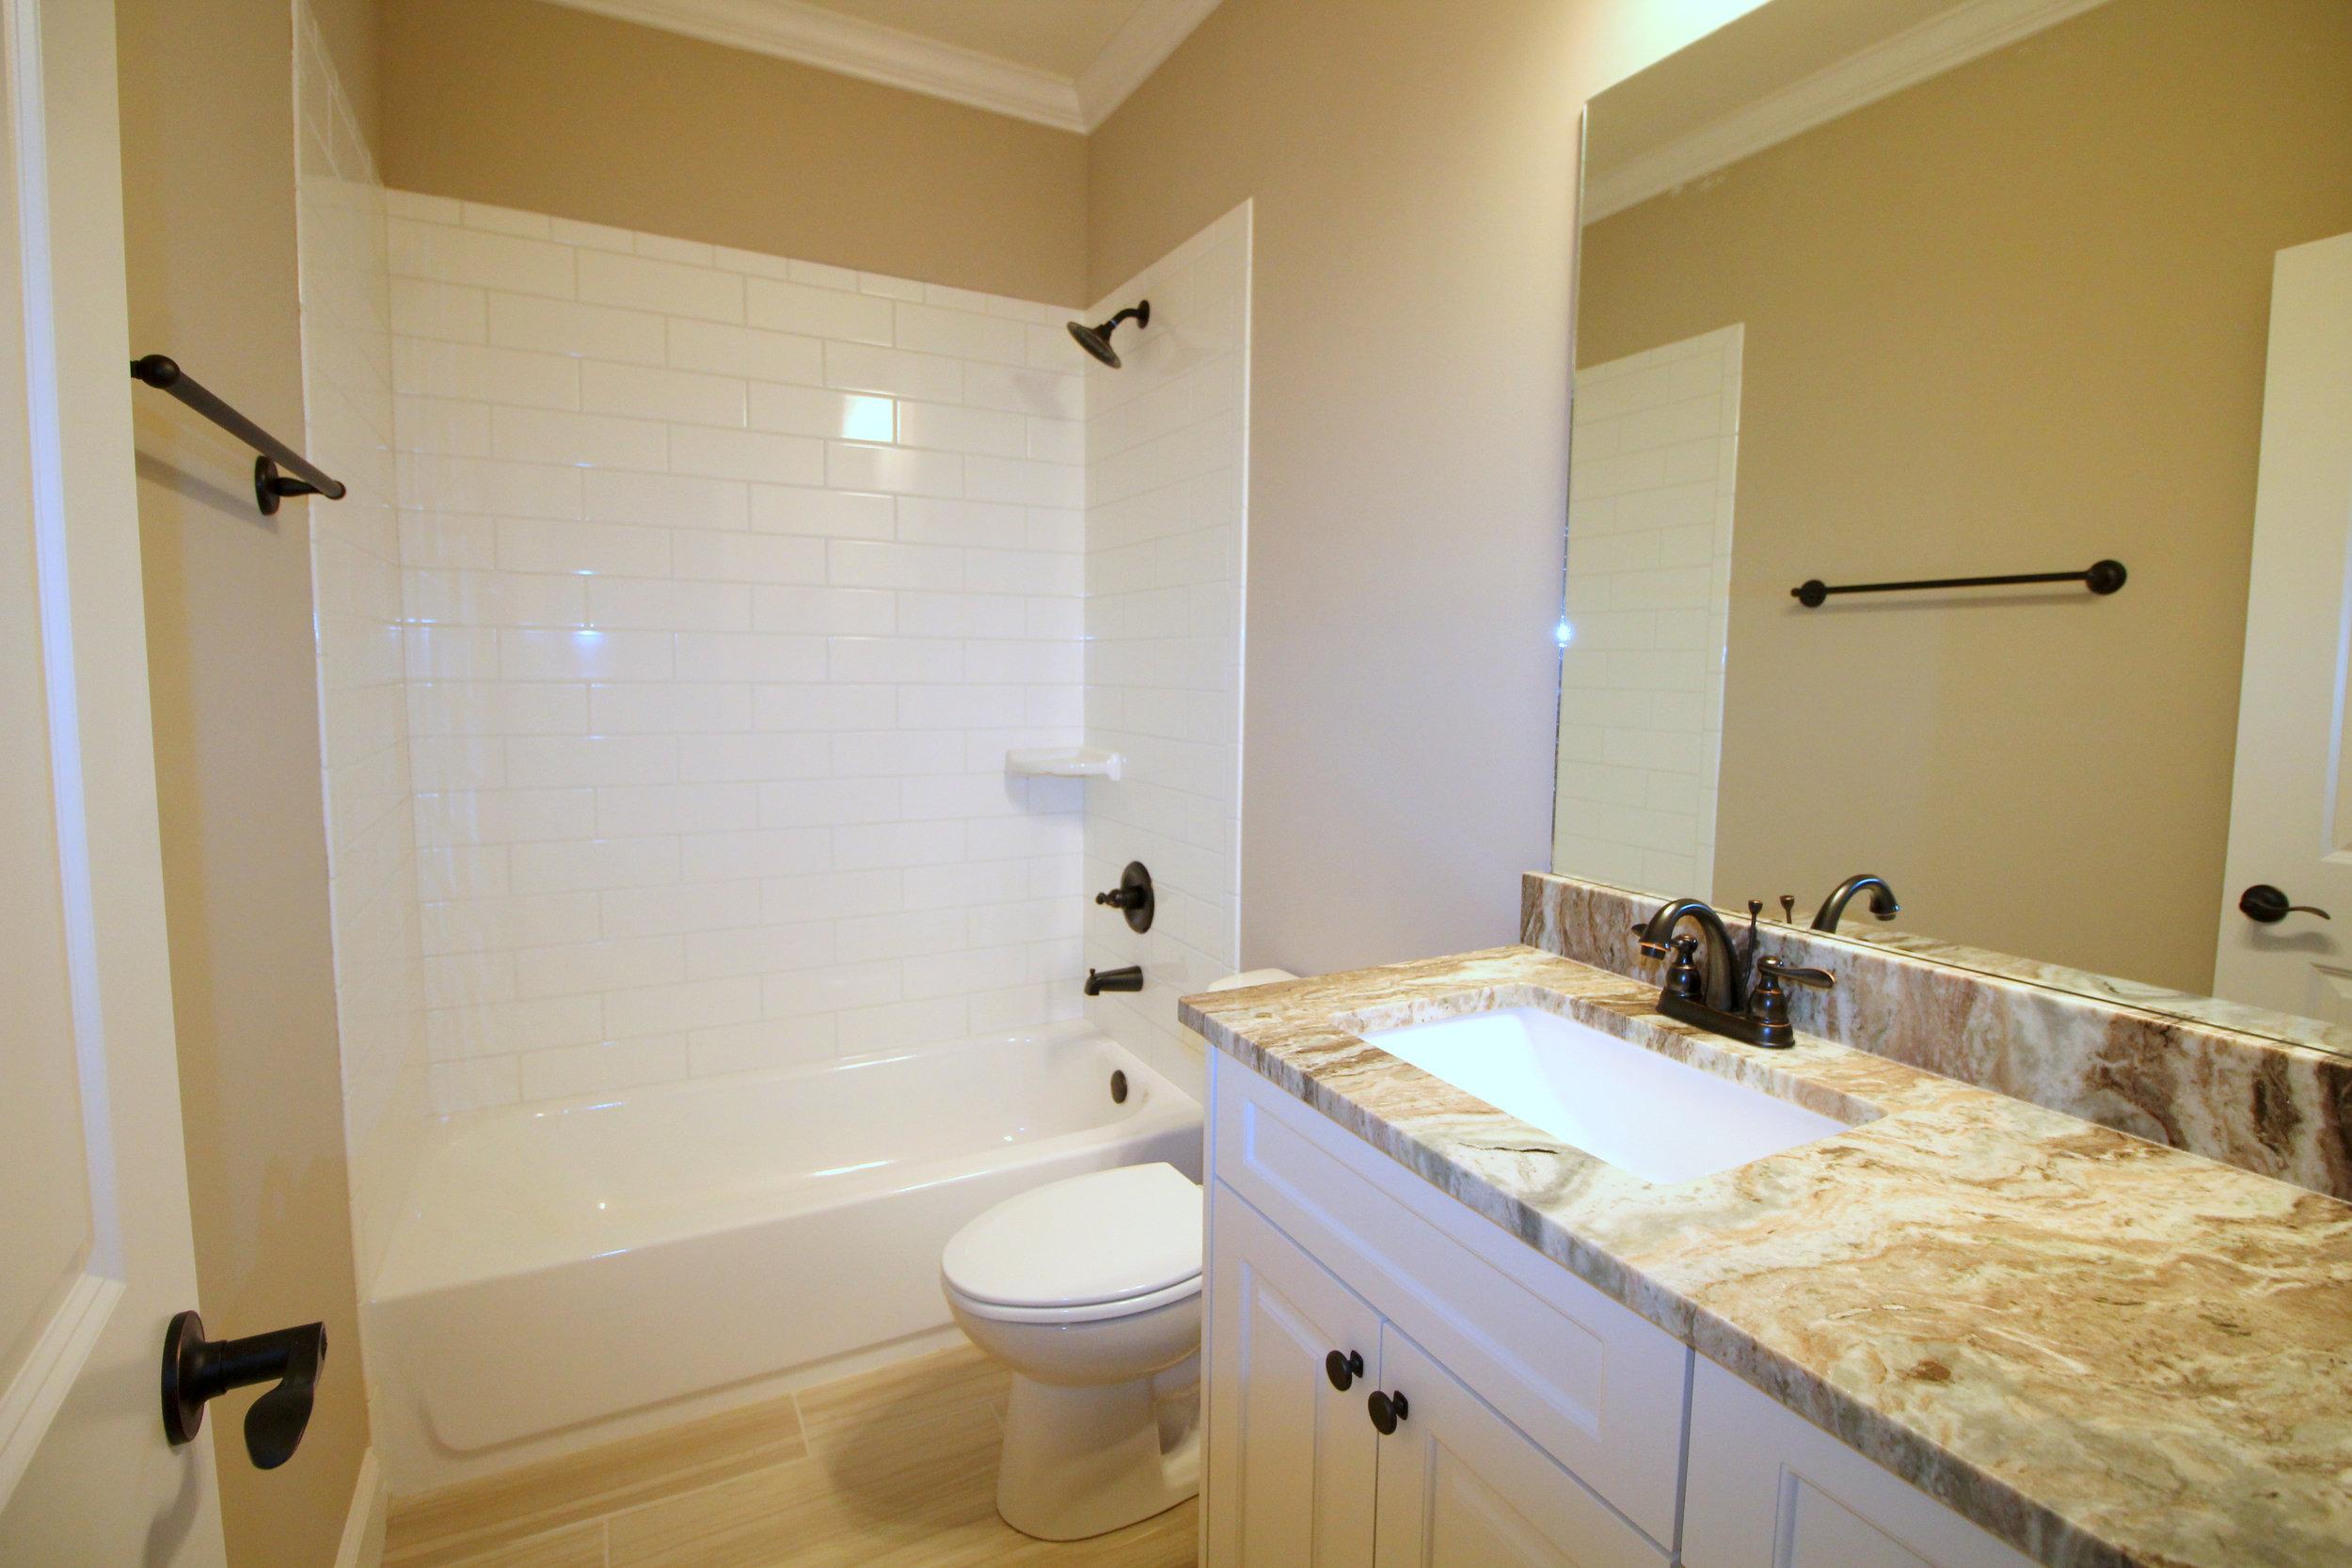 marble-bathroom-counter-tops-1756-greenleffe-drive-statham-ga-30666-the-georgia-club-oconee-county-oconee-springs-athens-area-home-for-sale-courtyard-homes.JPG